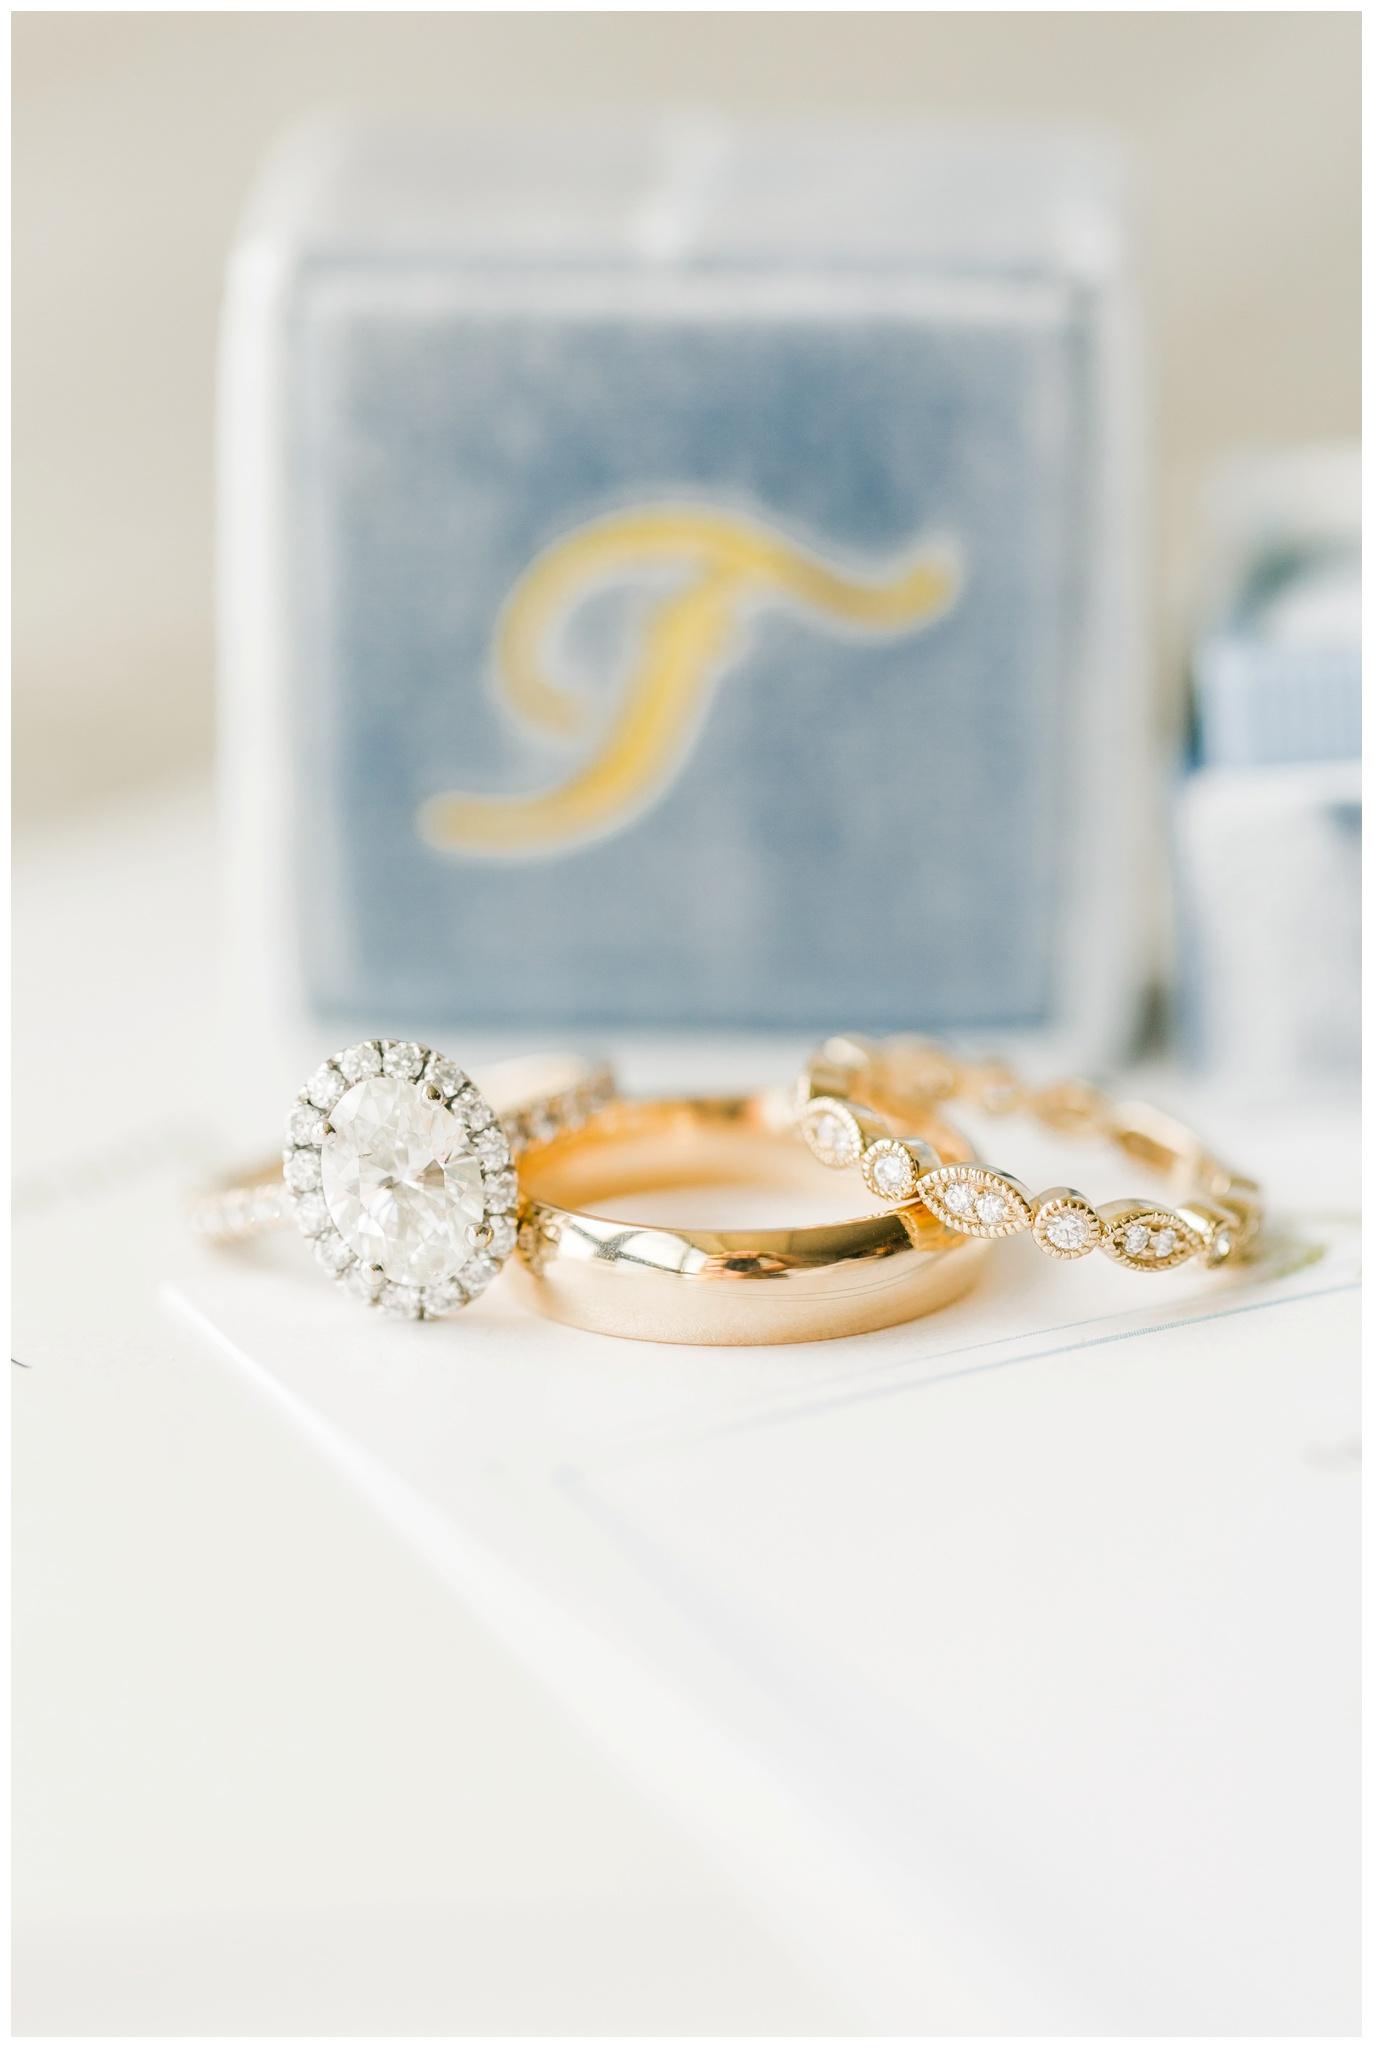 UW_Memorial_Union_wedding_madison_wisconsin_wedding_photographers_4578.jpg